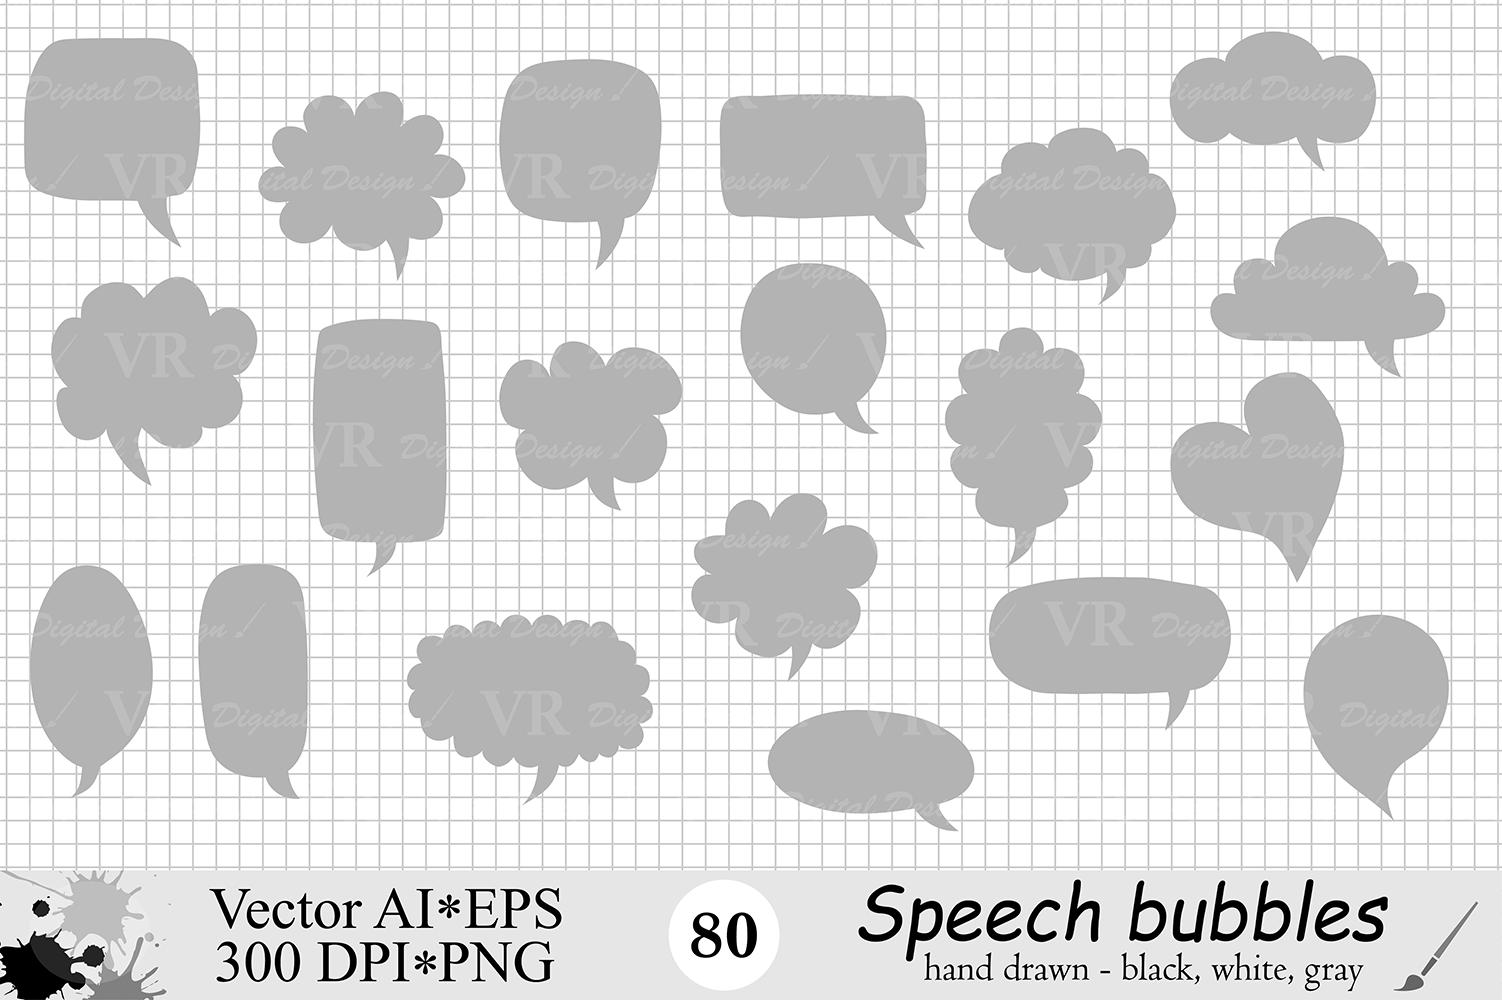 Speech Bubbles Clipart / Chat Bubbles / Hand drawn Text bubbles / Black, White, Gray - Vector example image 4